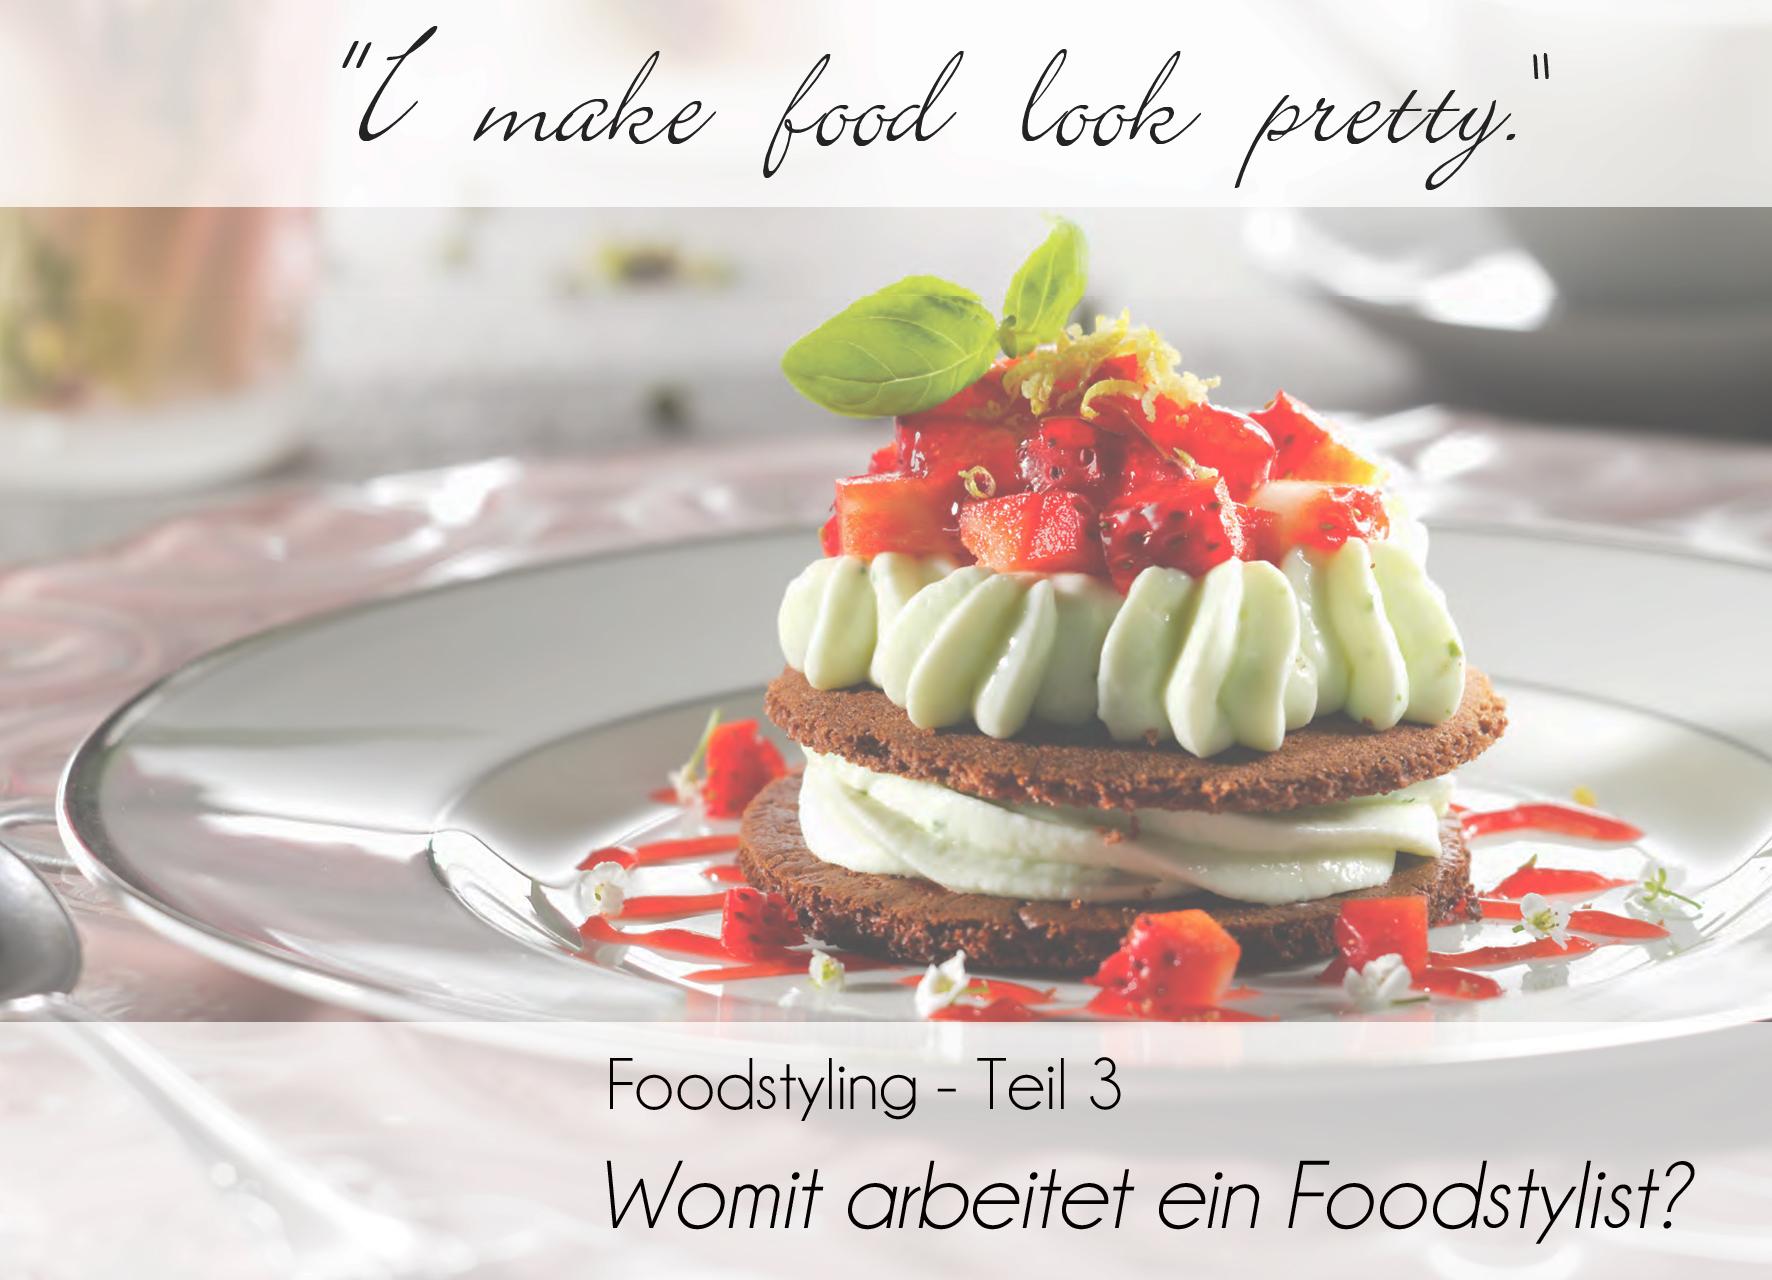 foodstyling beruf